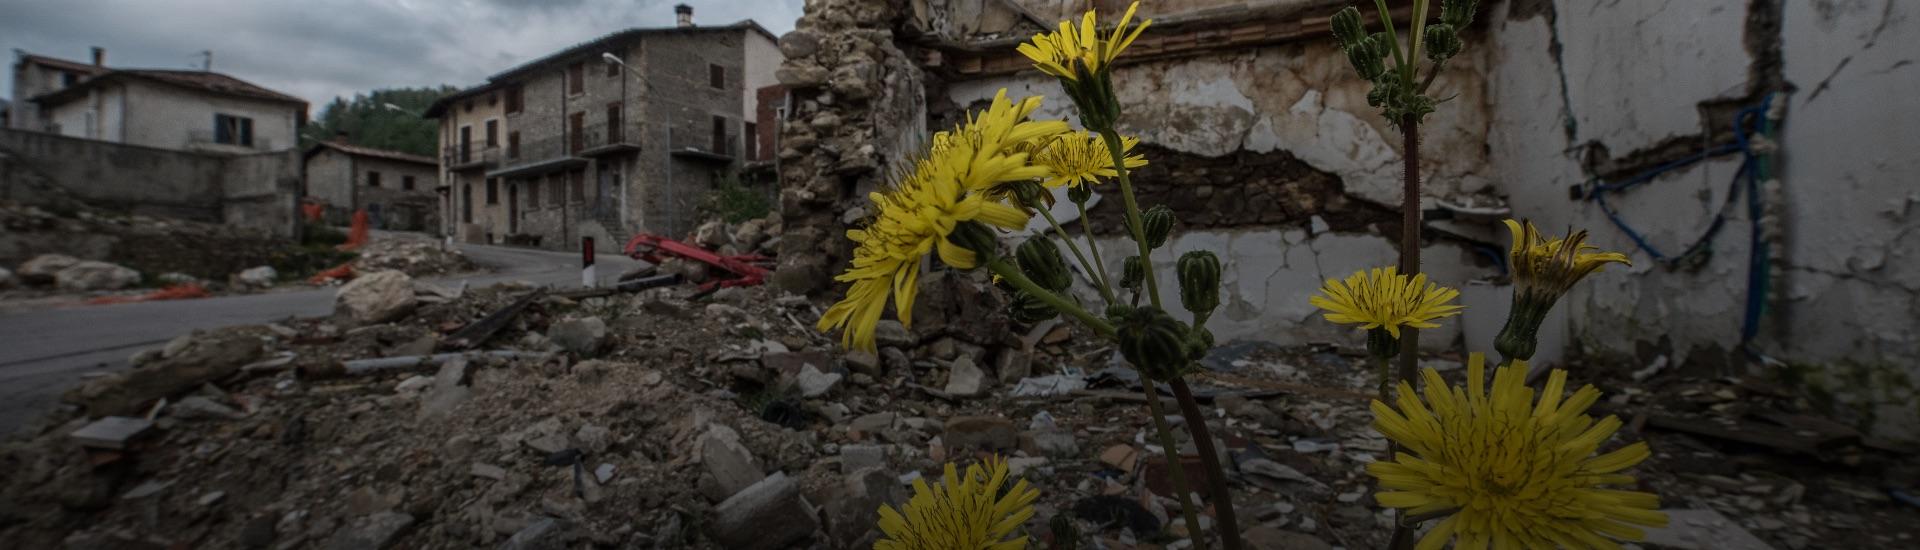 donazioni-terremoto-online